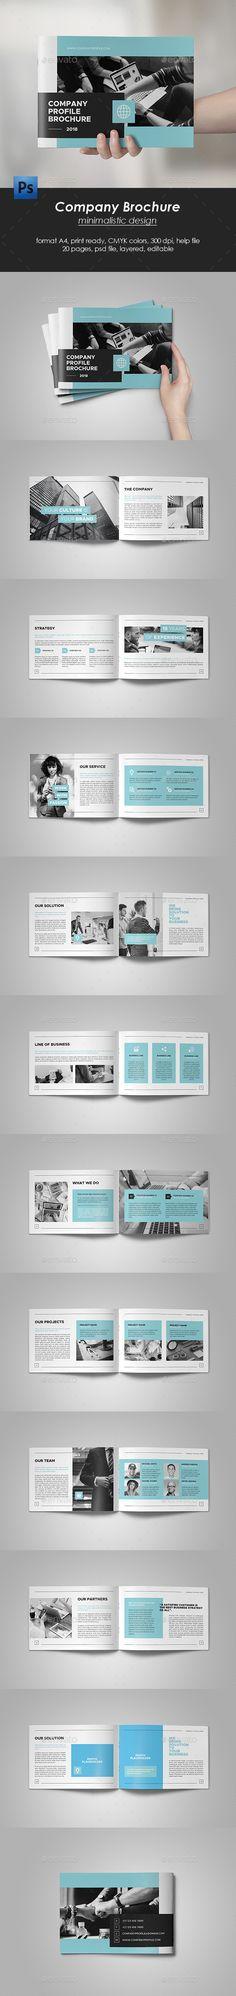 Company Brochure Template PSD